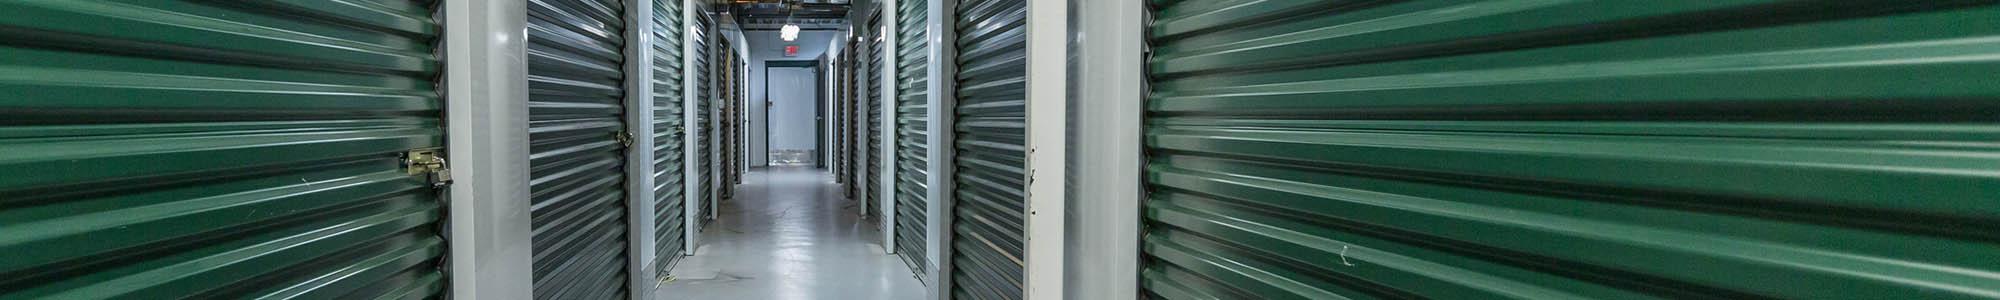 Reviews of self storage in Saint Paul MN